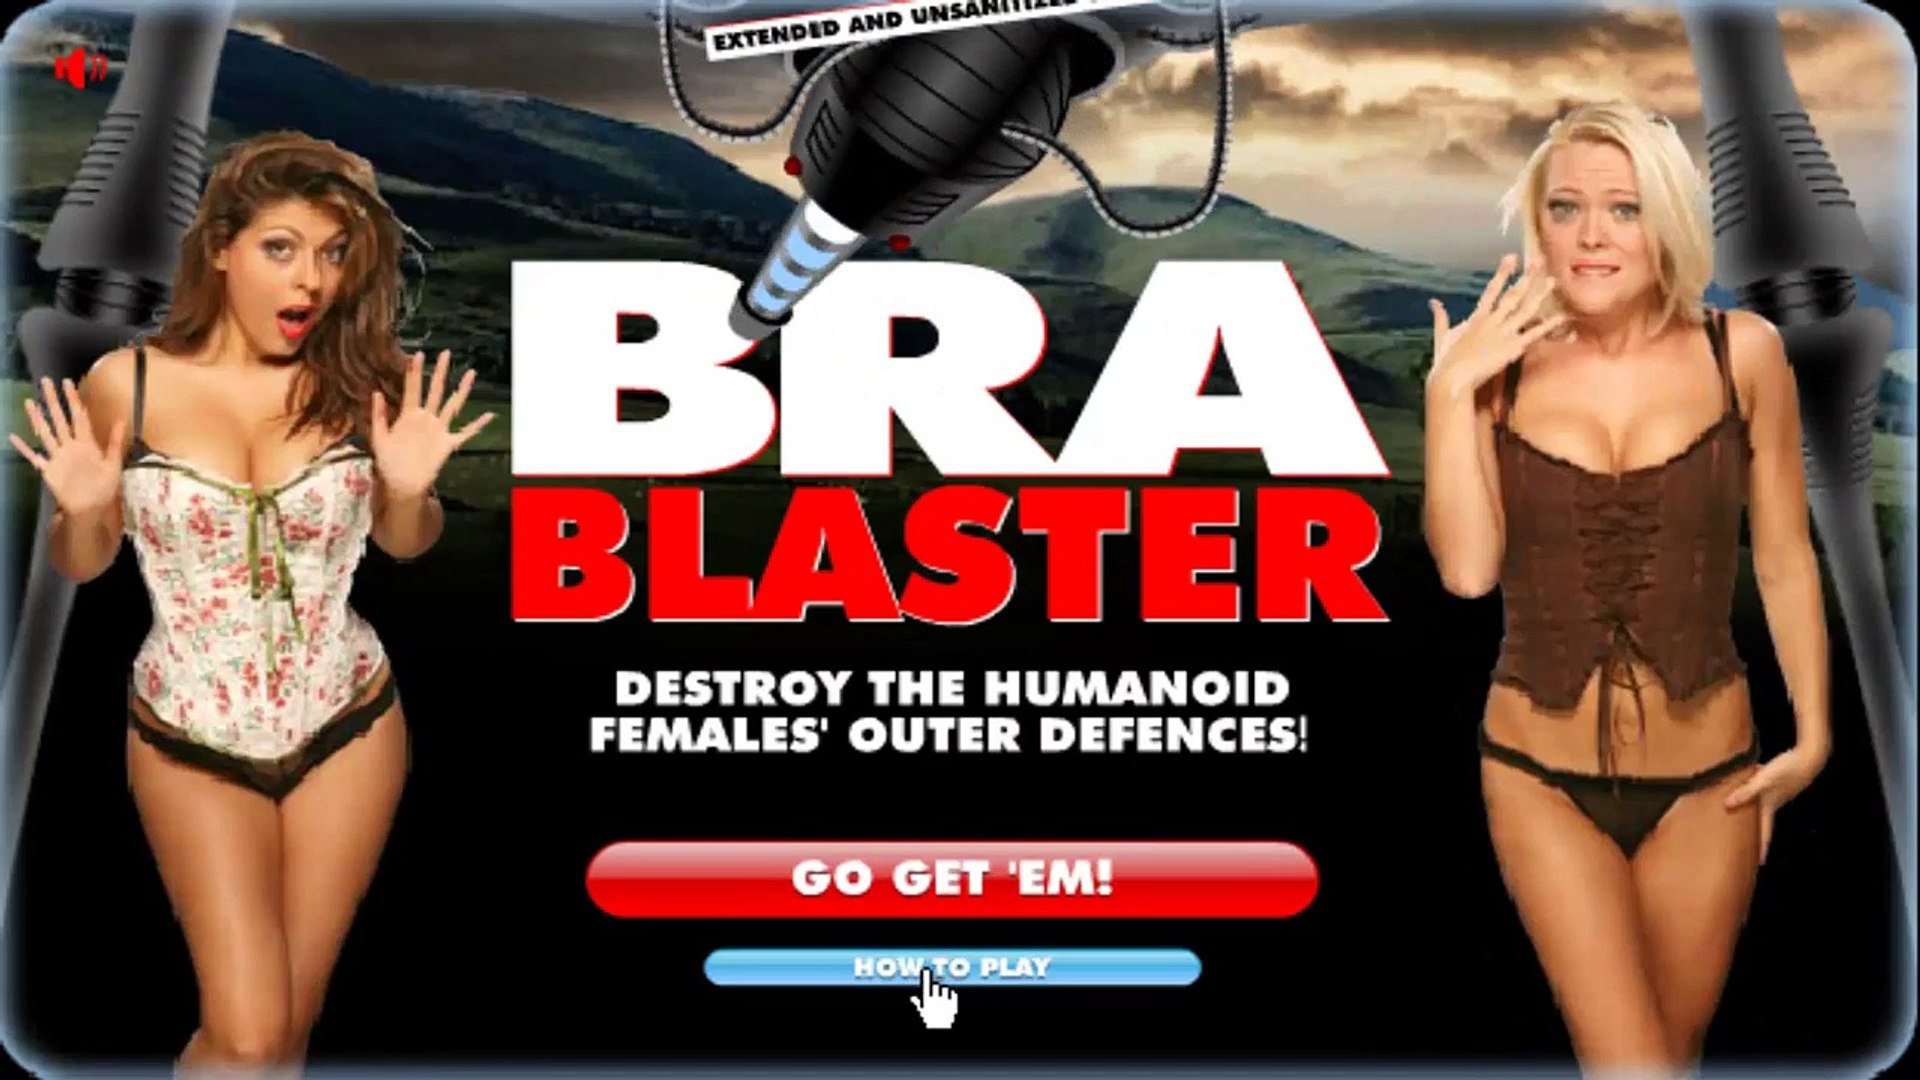 BRA BLASTER - Fun Flash Game to Blast the Bra ???